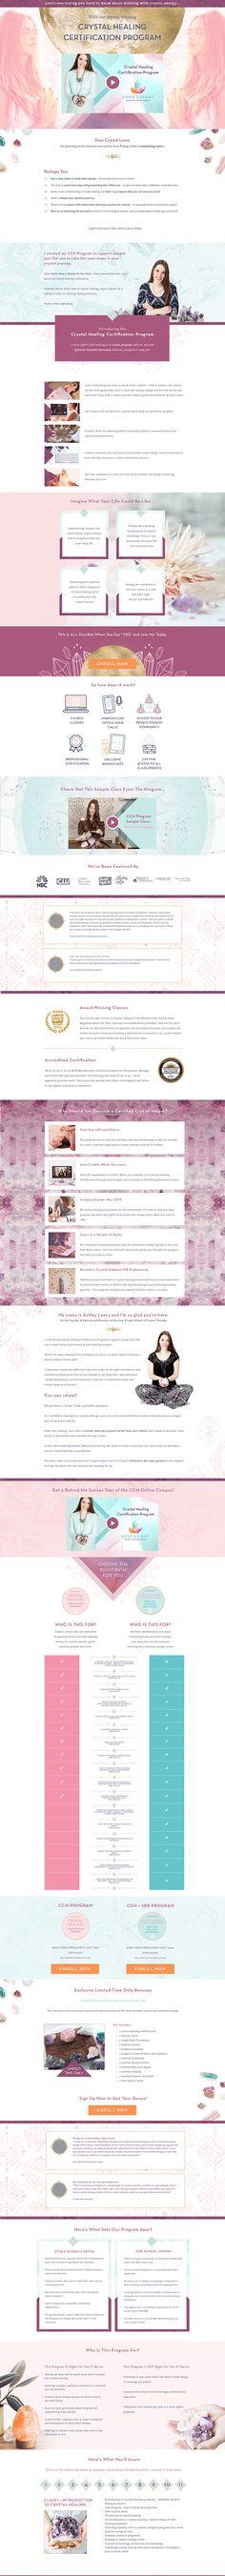 Page Design, Image, Design Web